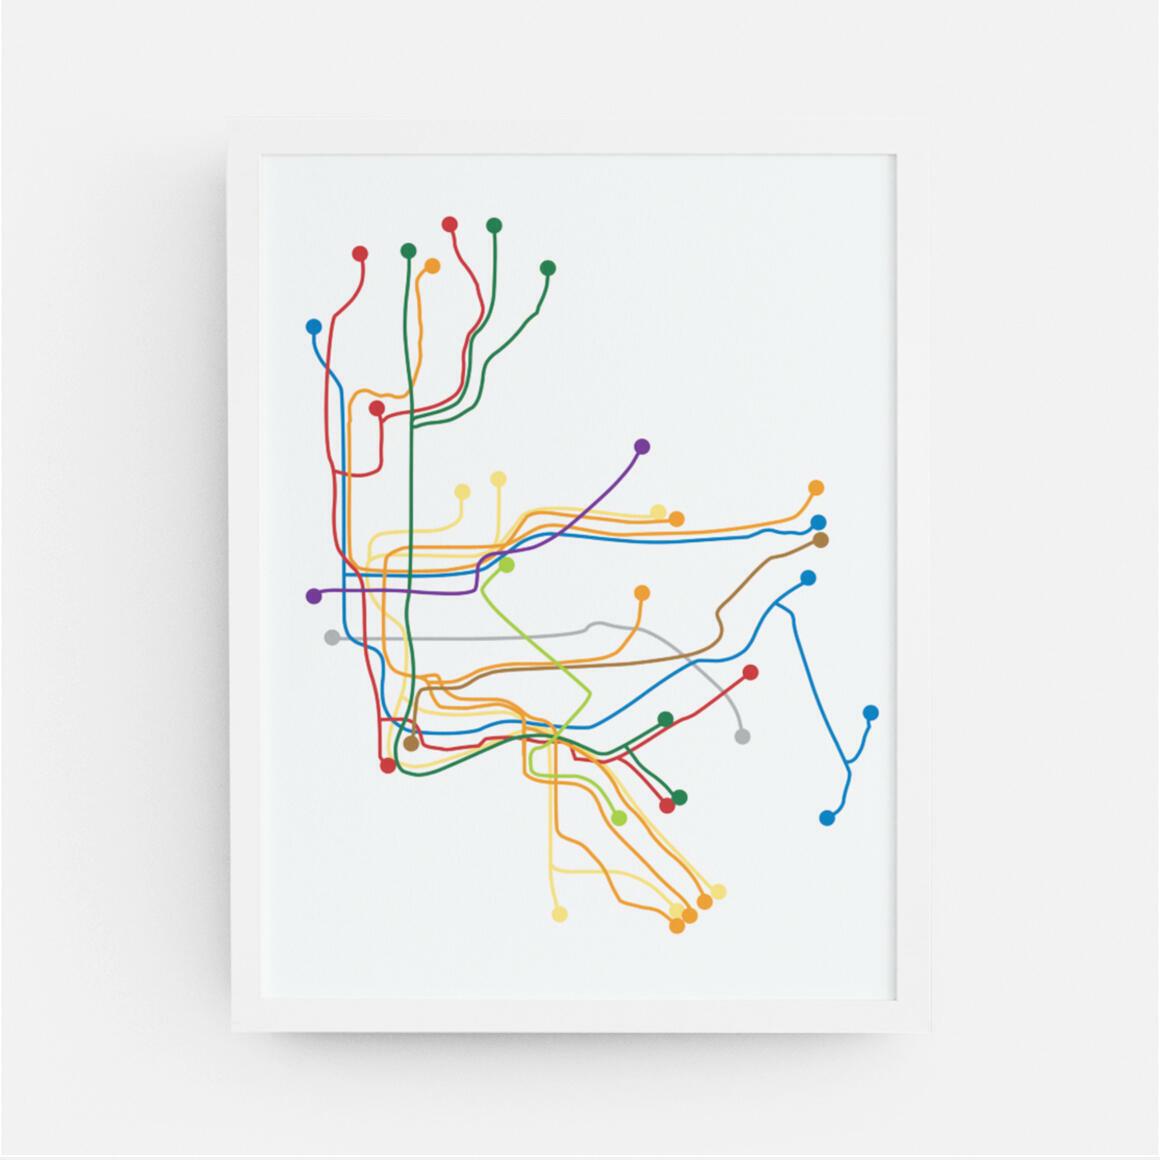 New York City Subway Map Print   Trada Marketplace